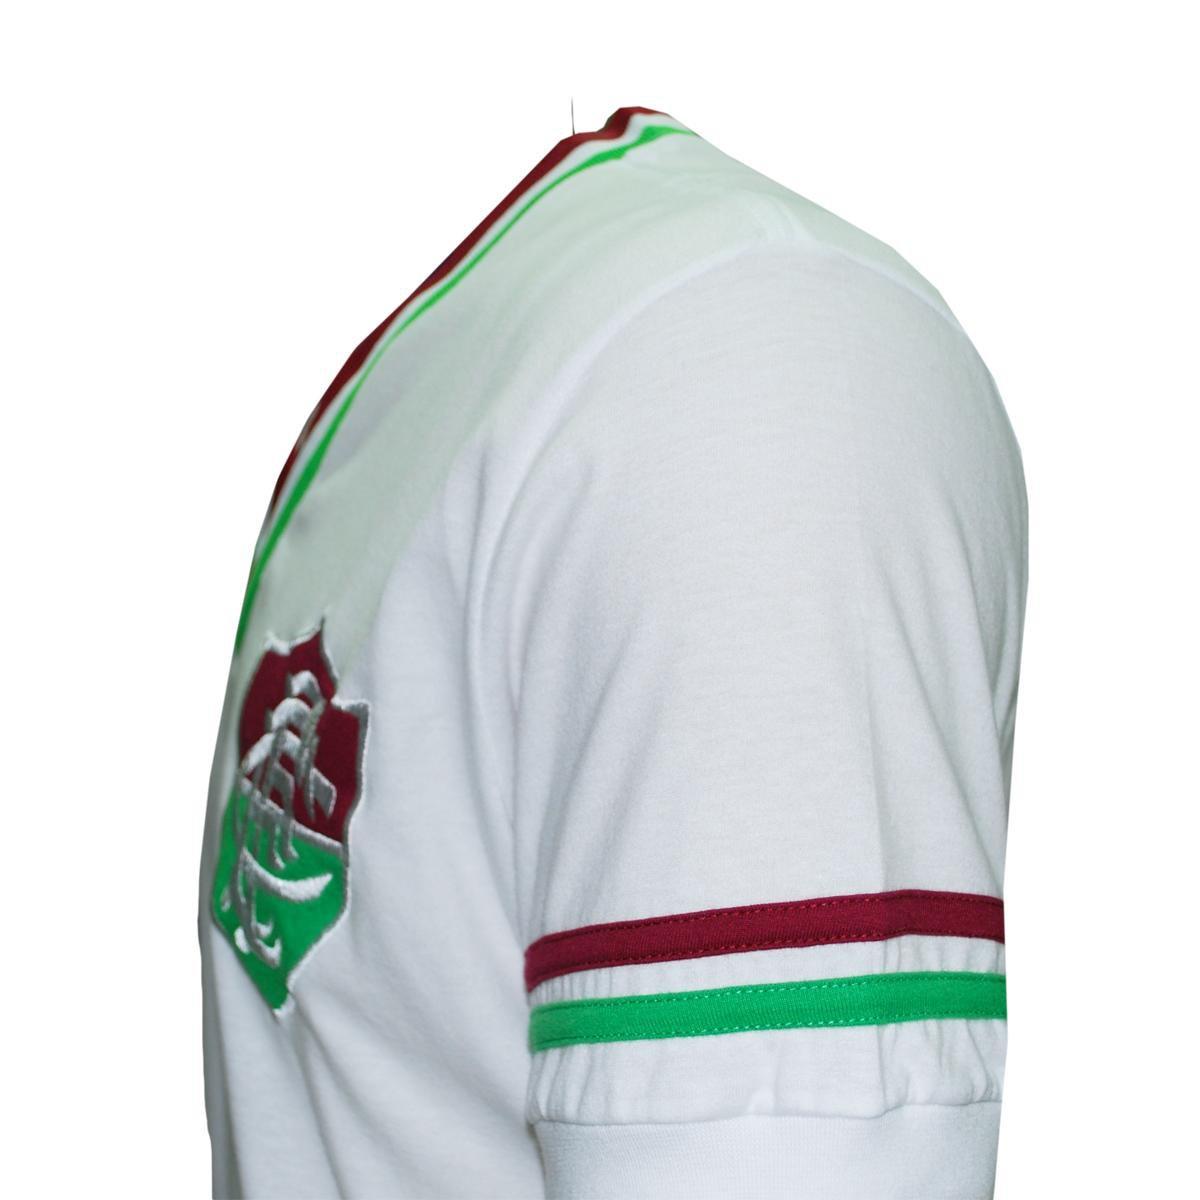 Camisa Liga Retrô Fluminense Mundial 1952 - Branco - Compre Agora ... 8966a94d57d3c